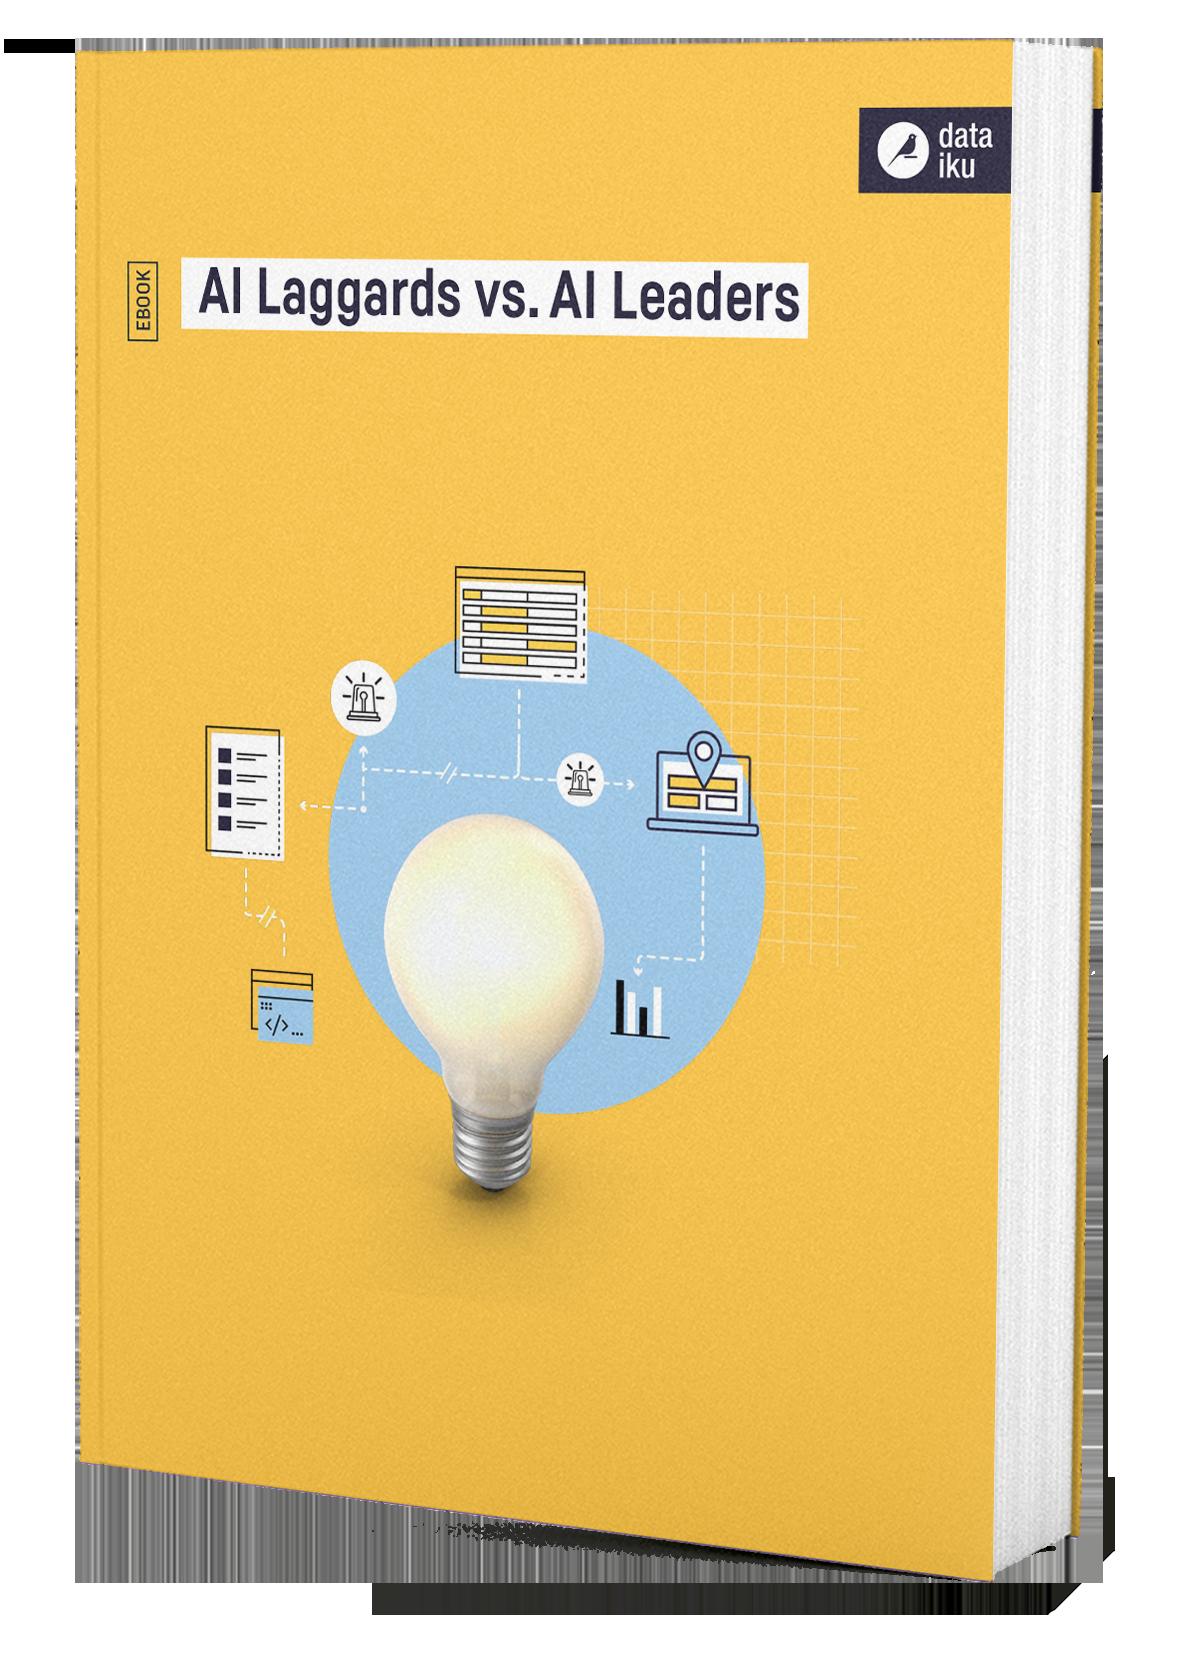 AI-Laggards-vs-Leaders